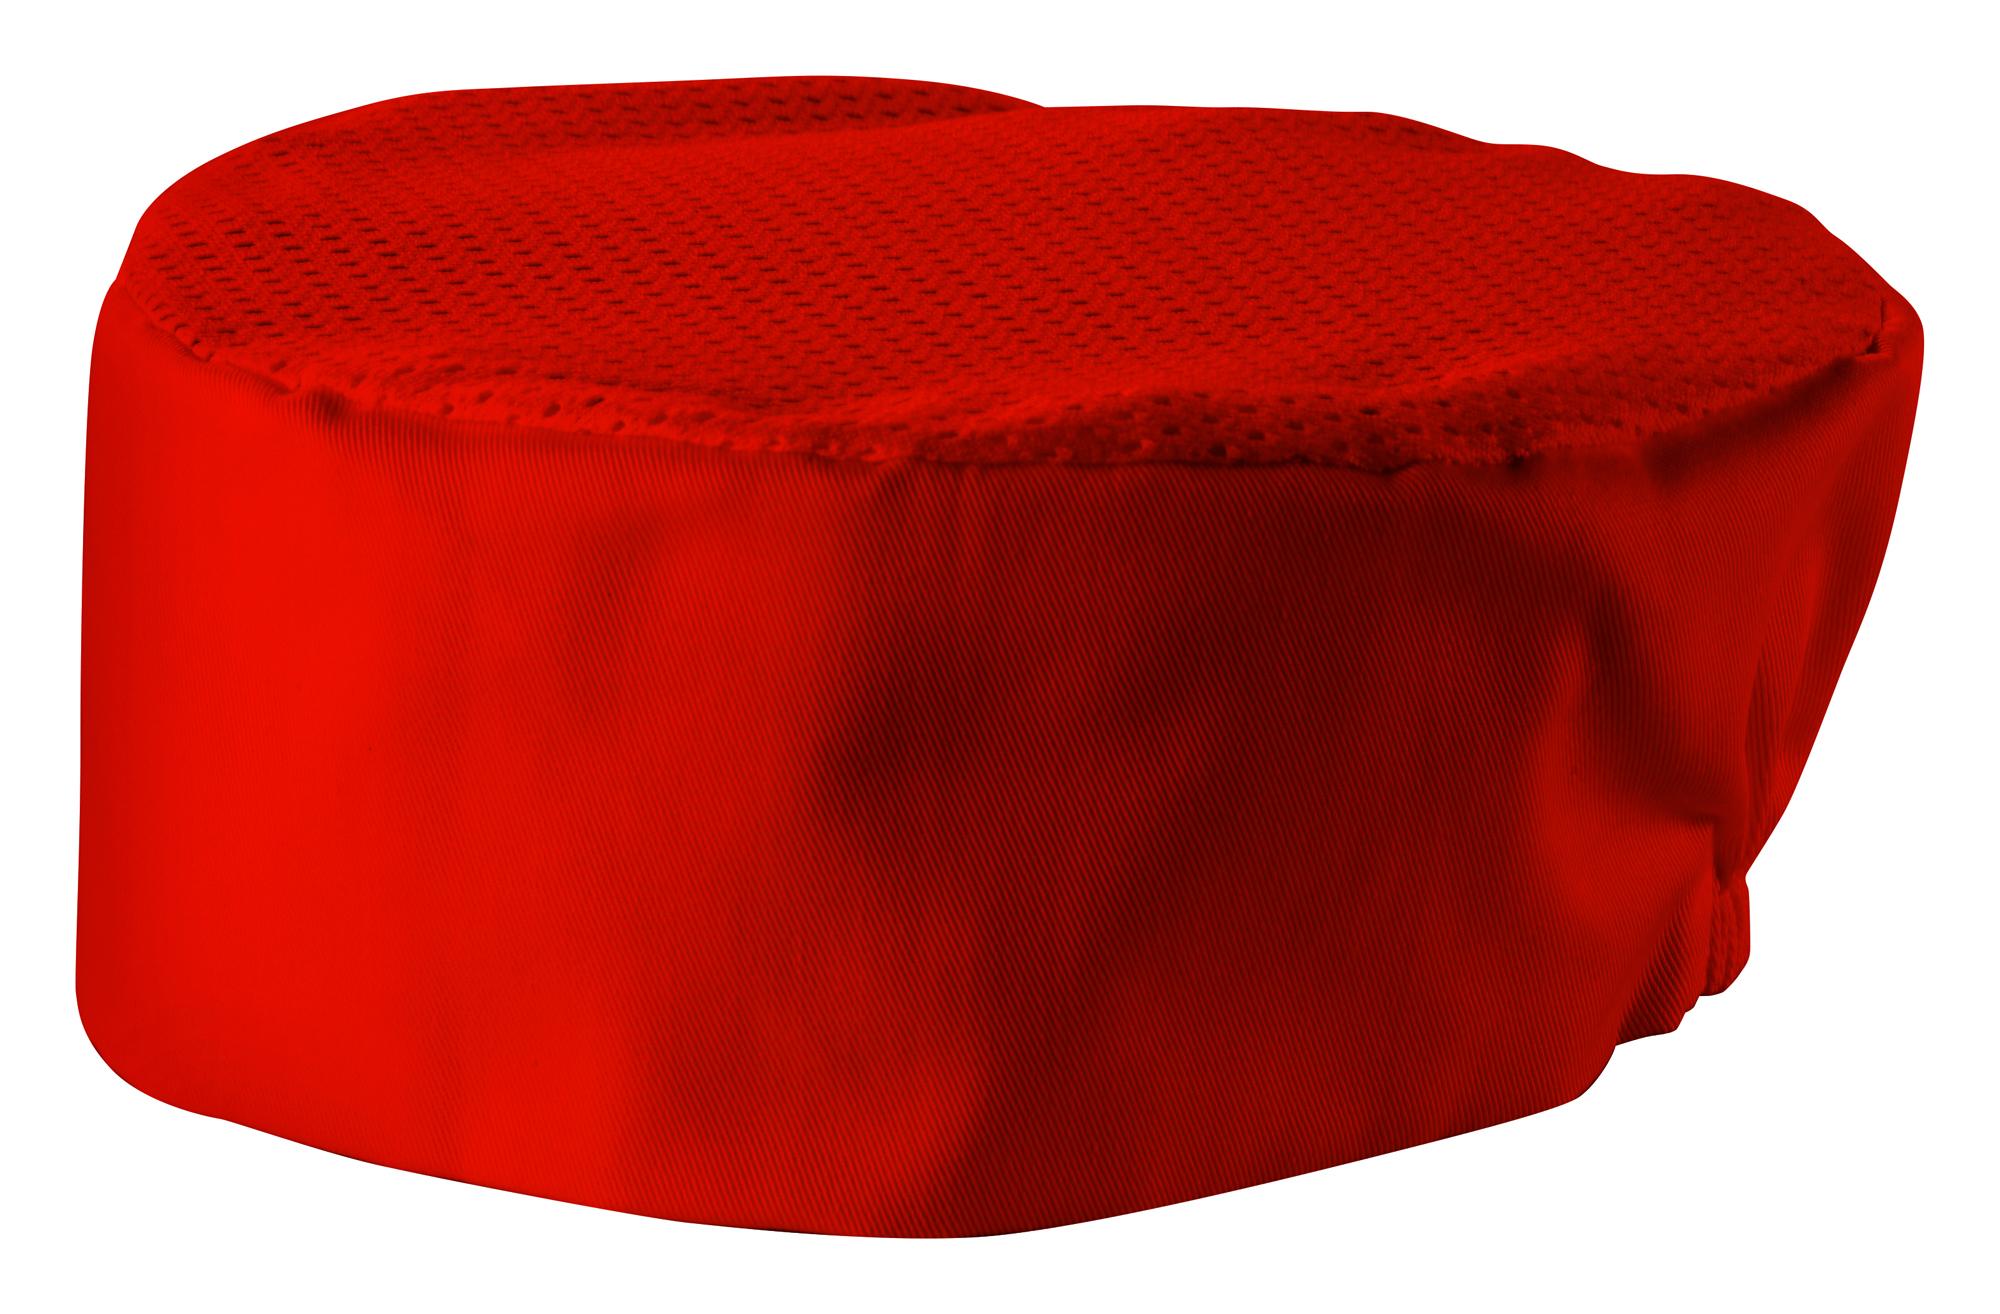 Winco CHPB-3RR ventilated pillbox hat